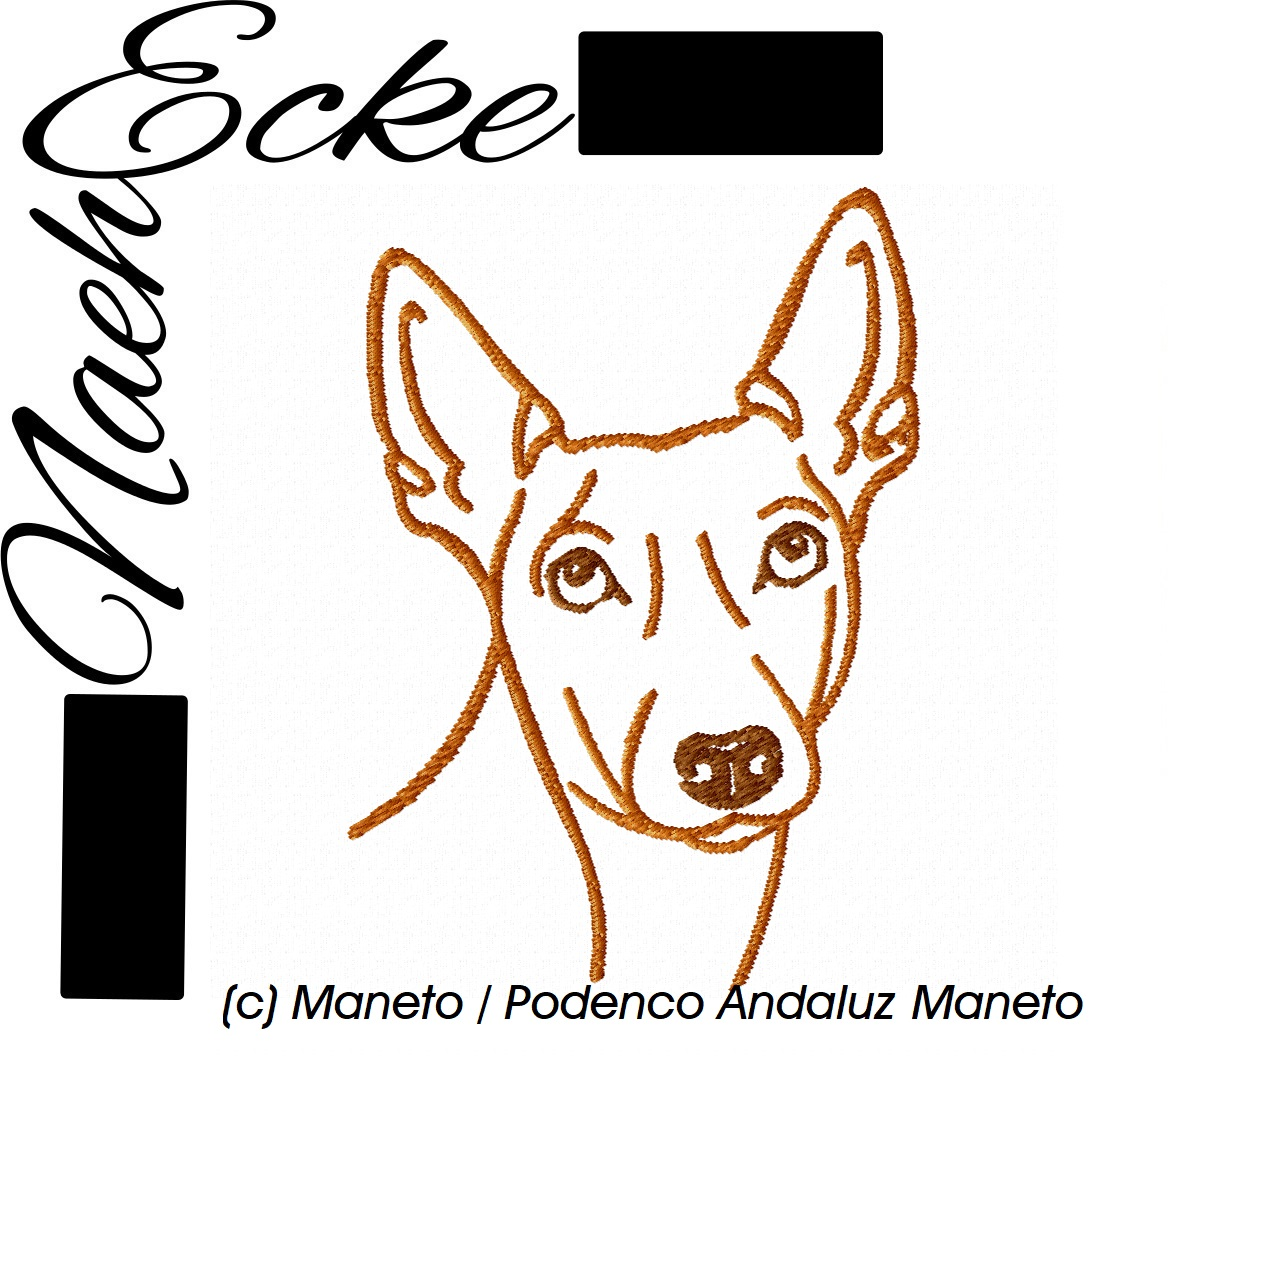 Maneto / Podenco Andaluz Maneto